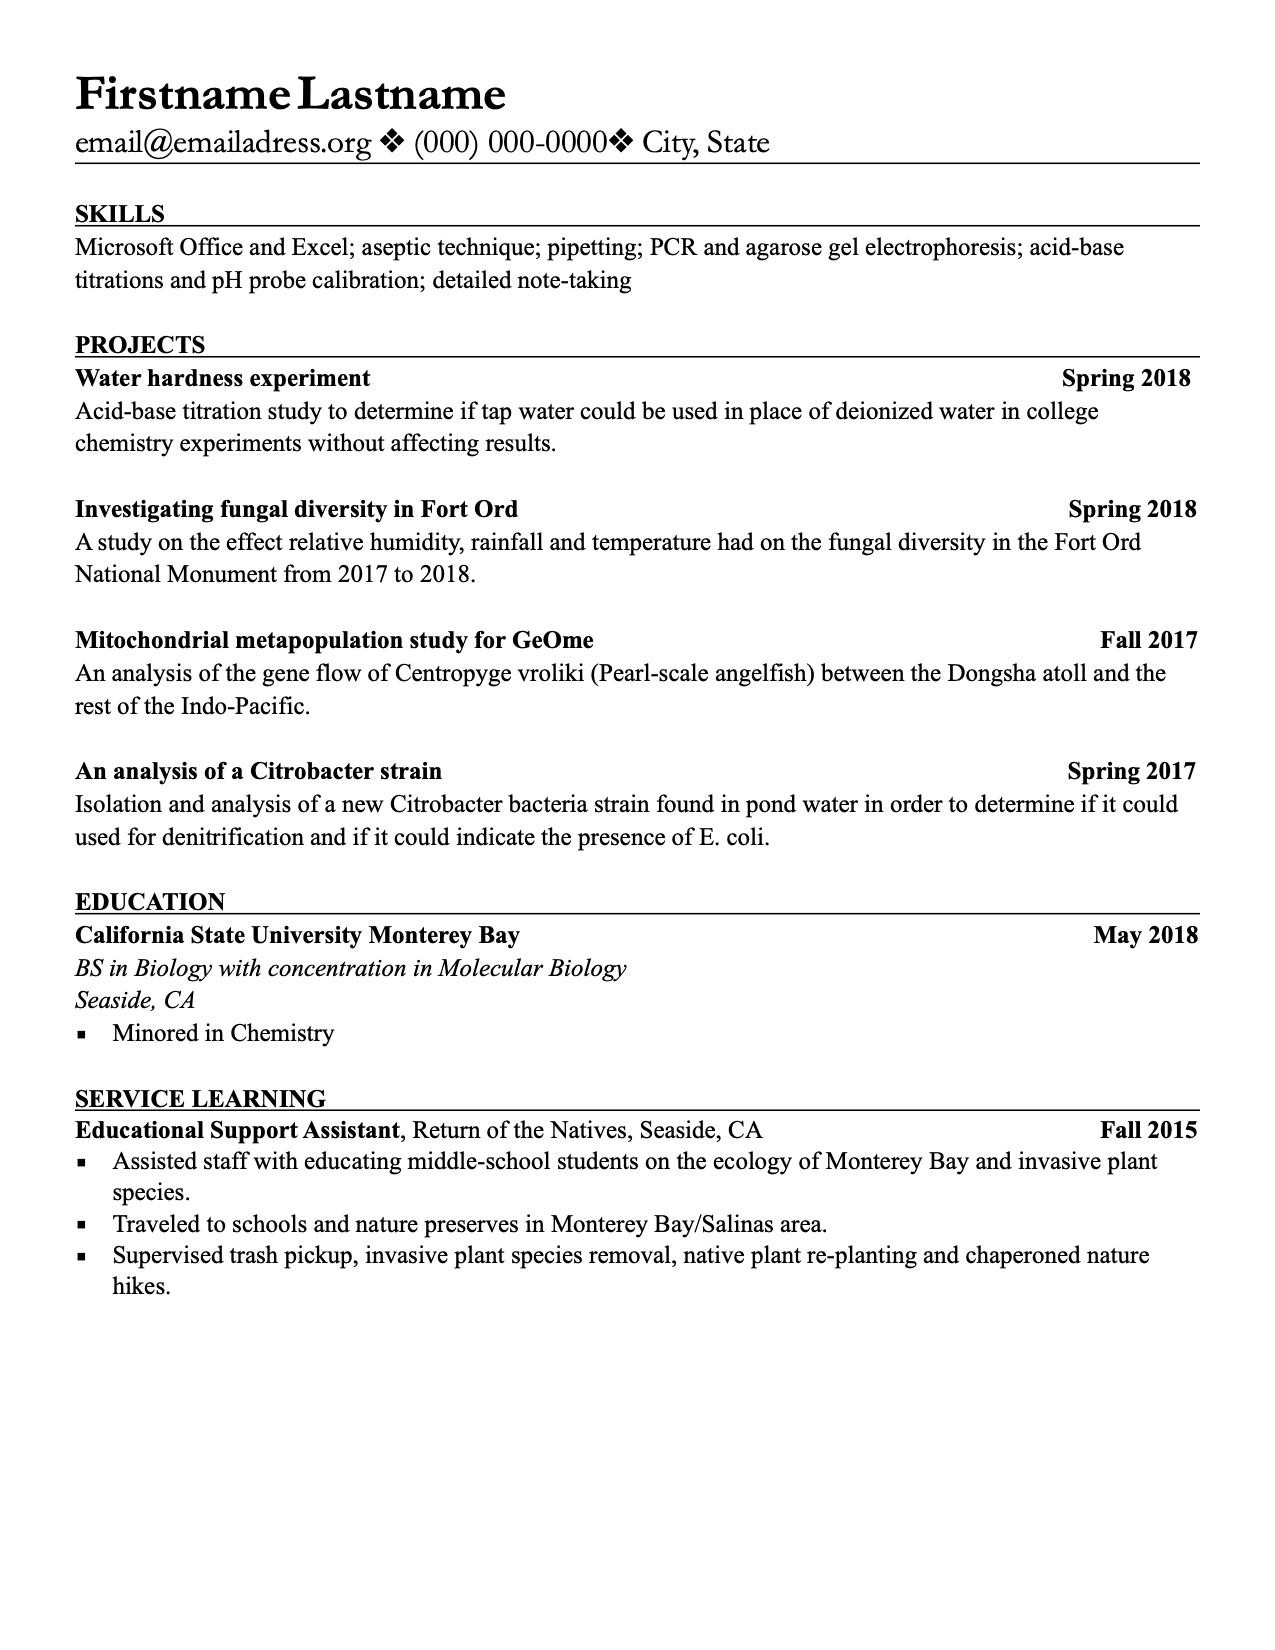 graduated in may 2018 never had a job need